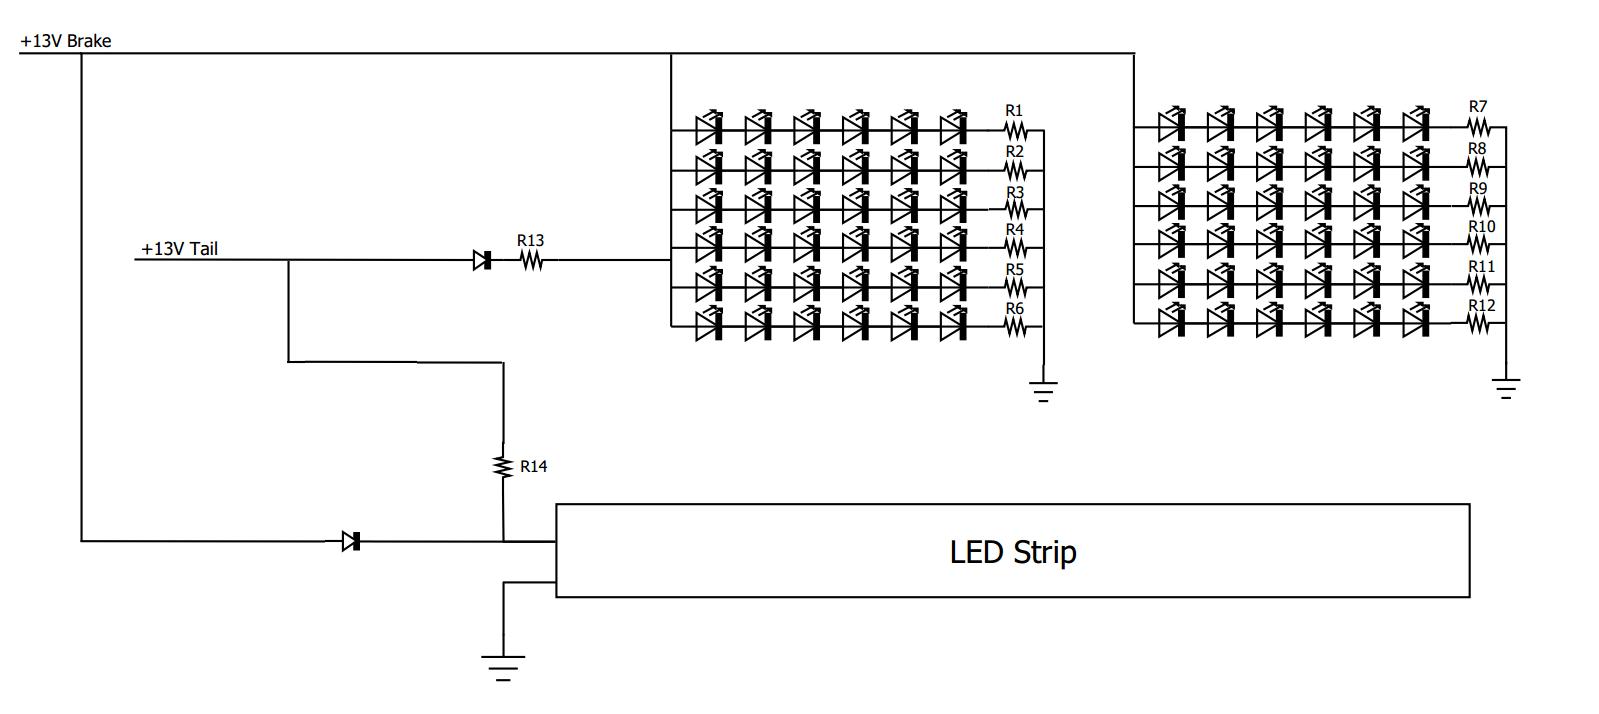 hight resolution of 12v led stop light wiring diagram wiring library 12v led off road light wiring diagram 12v led stop light wiring diagram